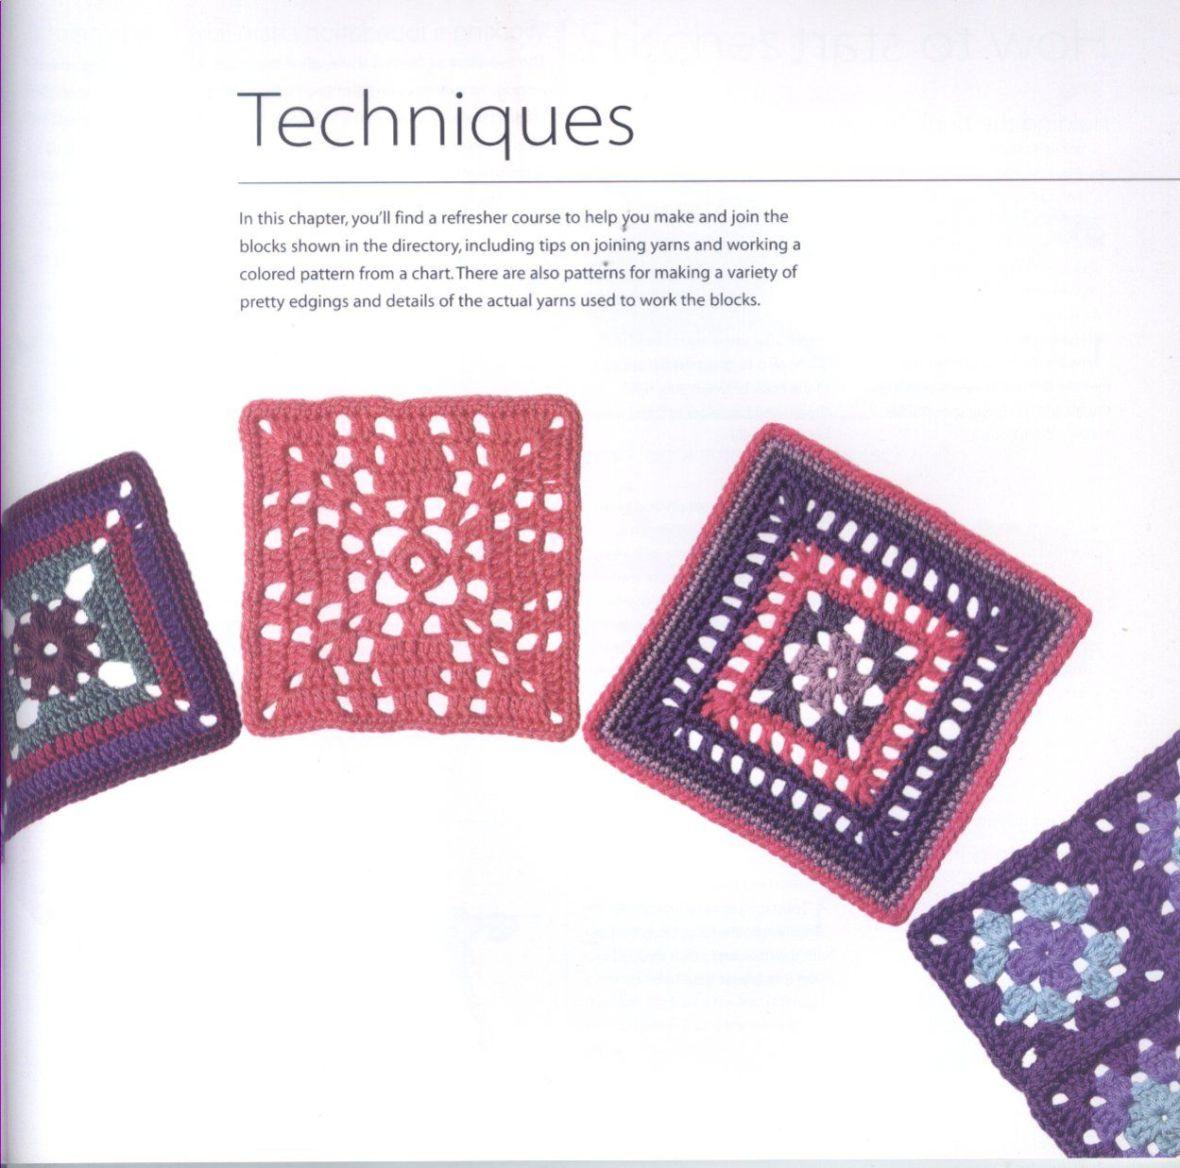 200 Crocheted Blocks for blankets, throws & Afghans 113